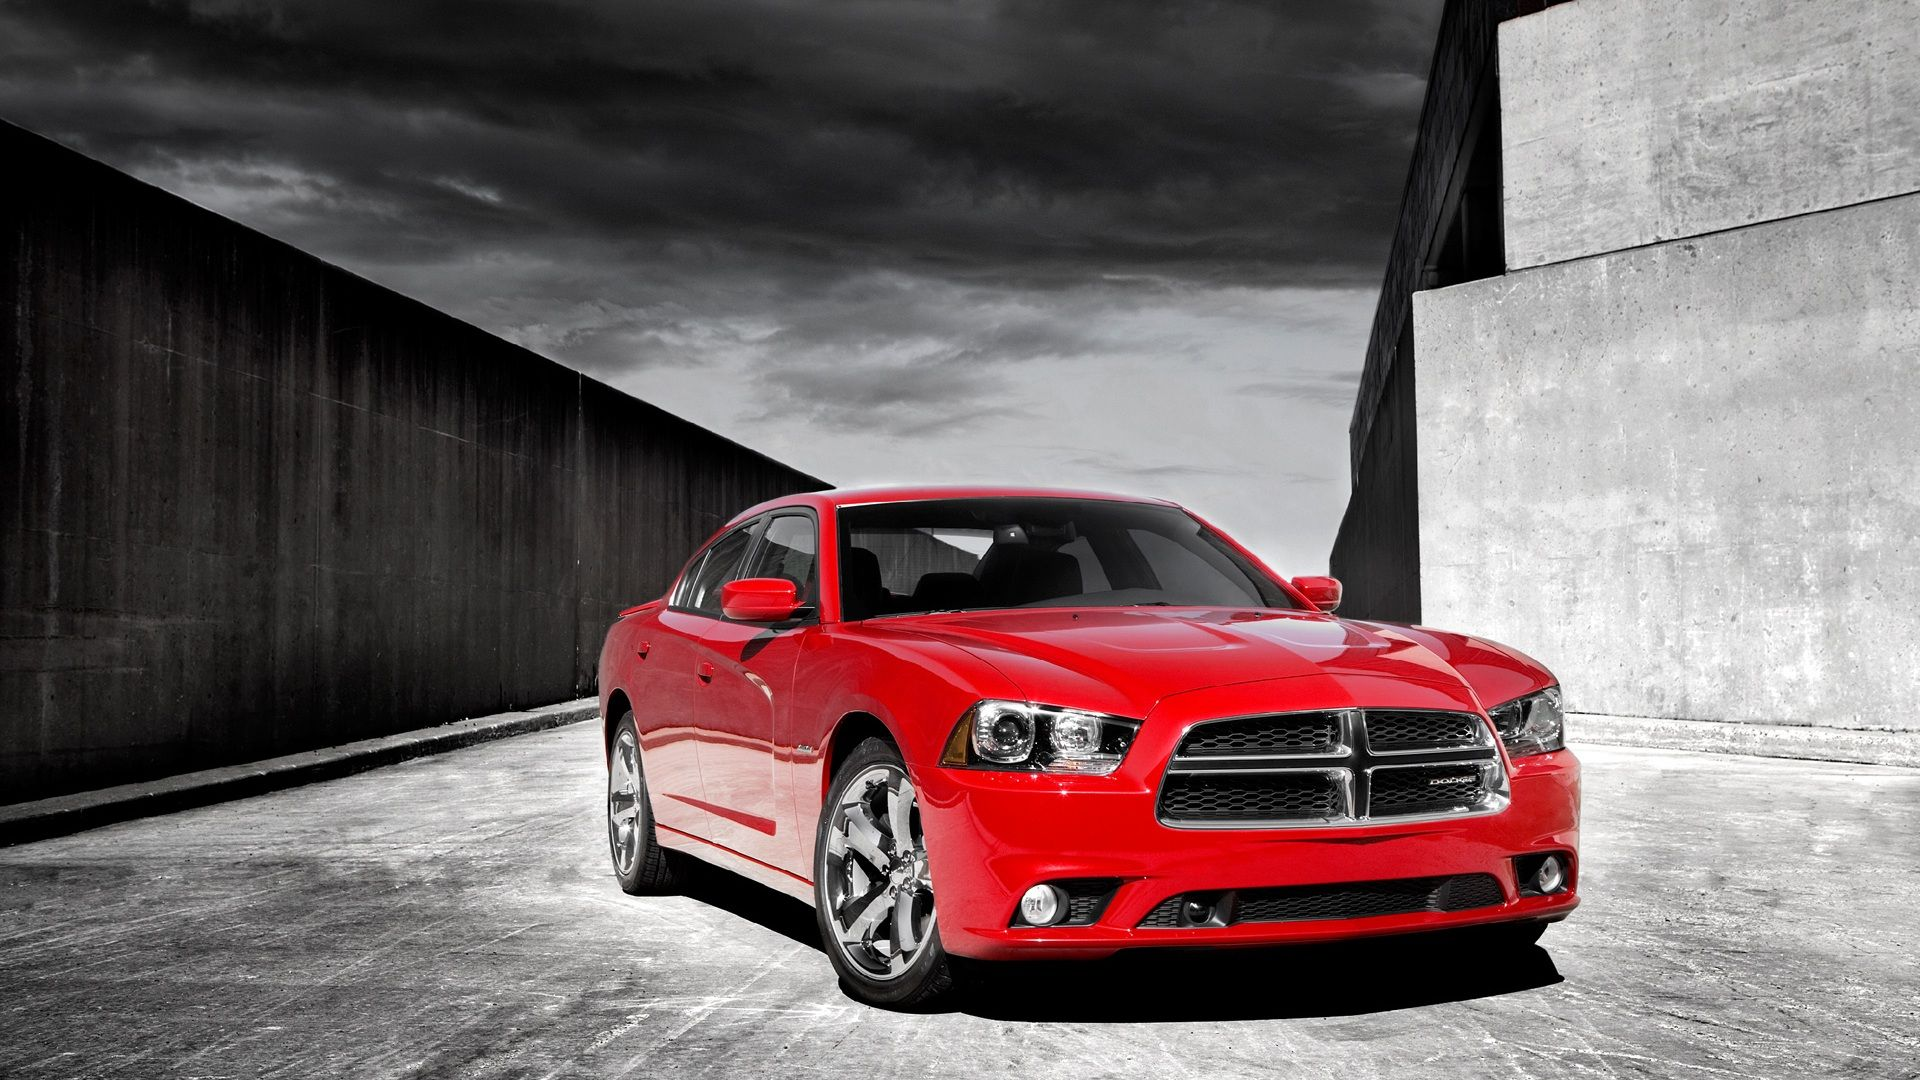 2014 Dodge Dart SRT4 Background Wallpaper